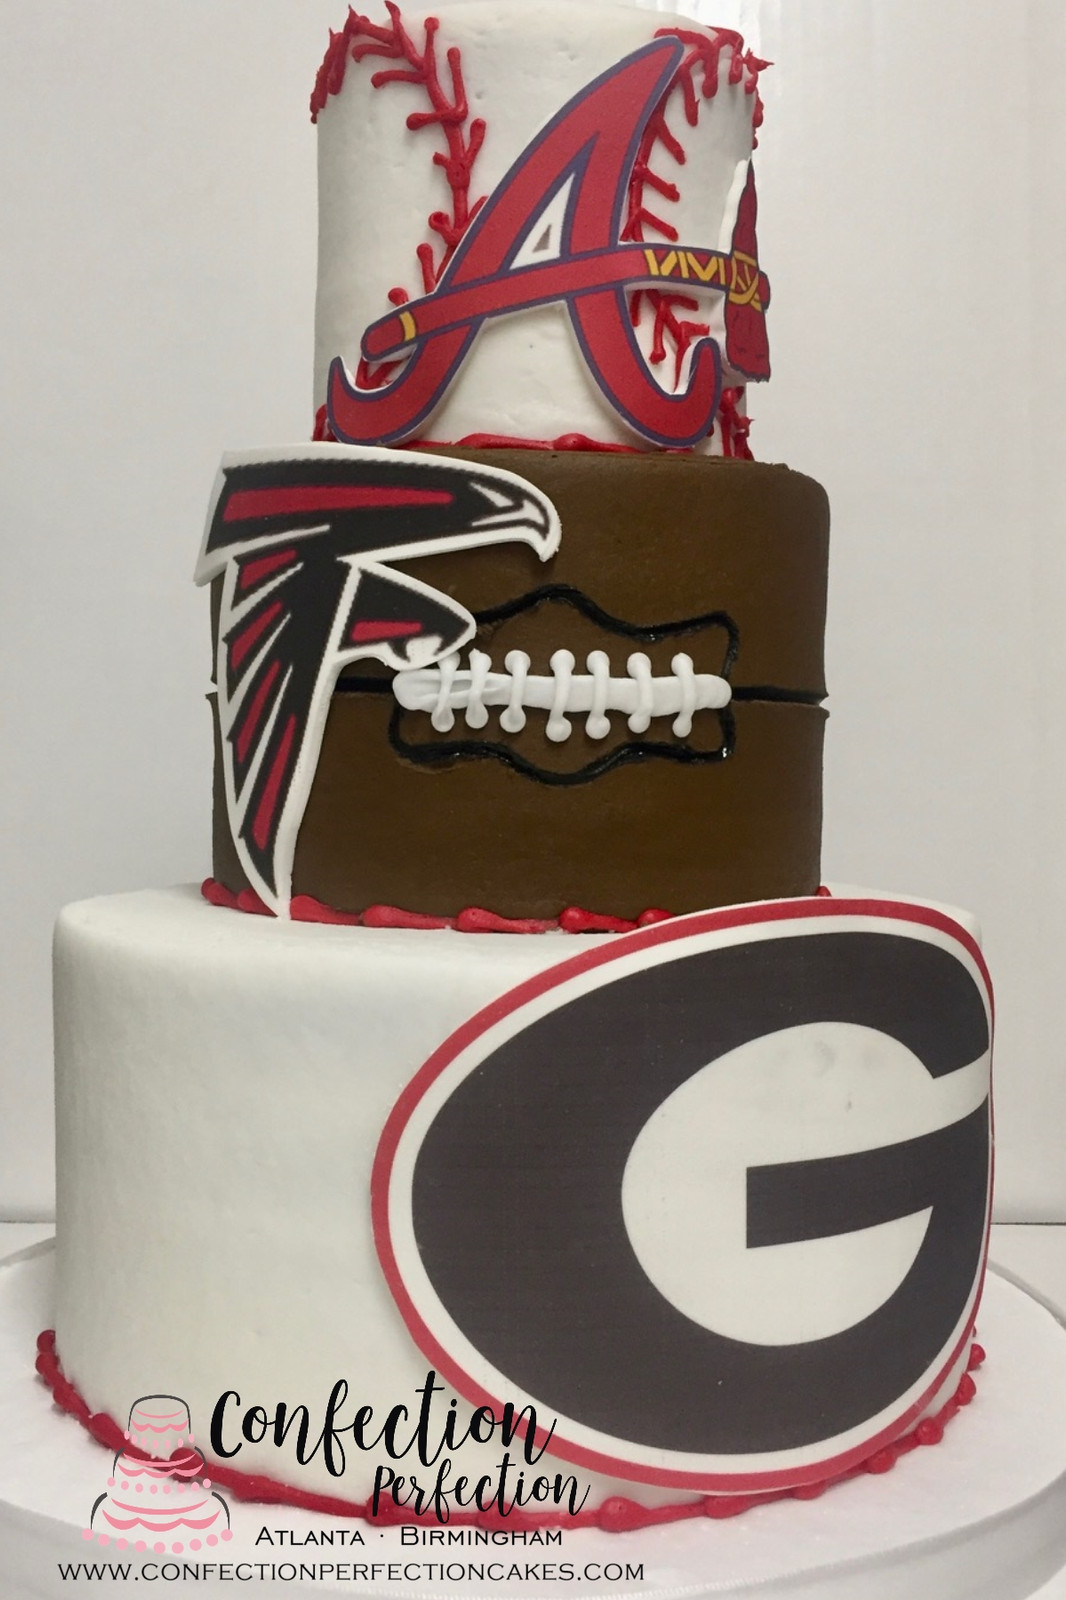 Multi Sports Team 3 Tier Cake Atlanta Braves Falcons And Georgia MB